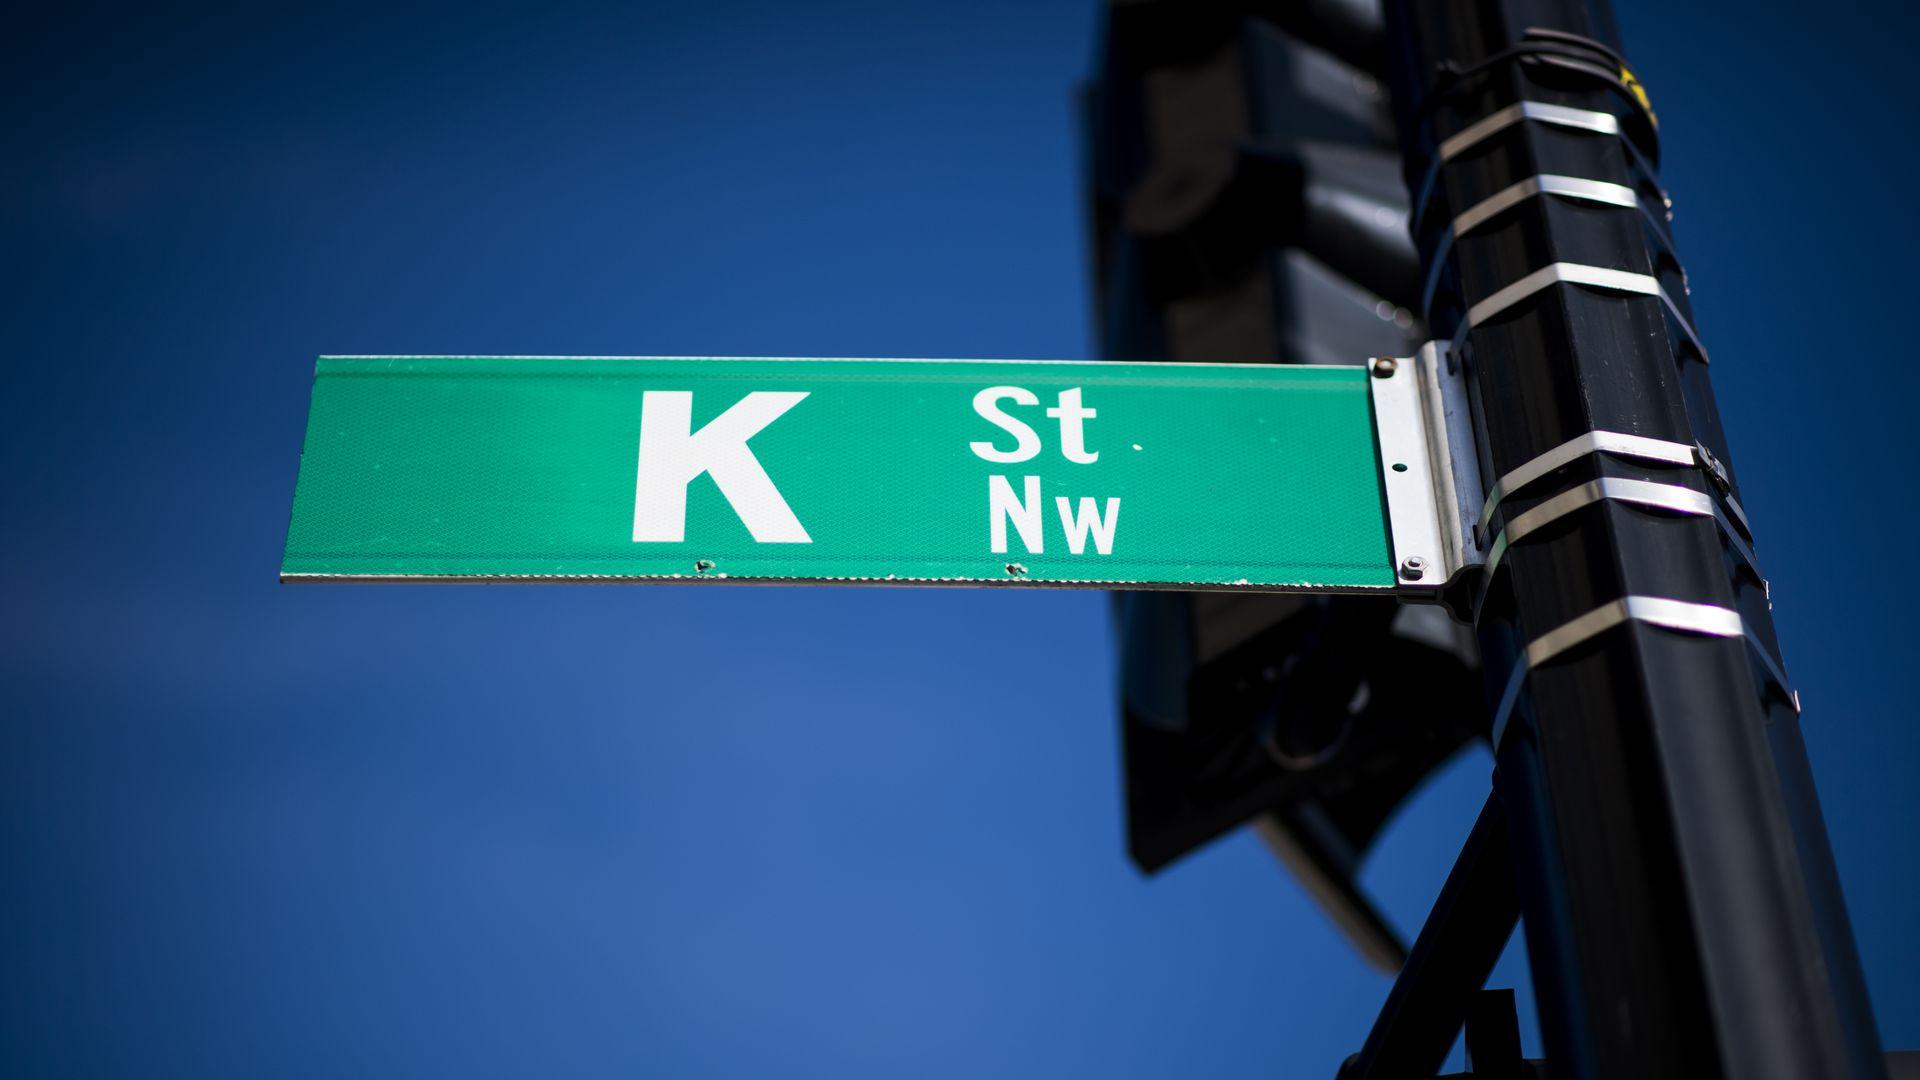 K Street sign in Washington, D.C.